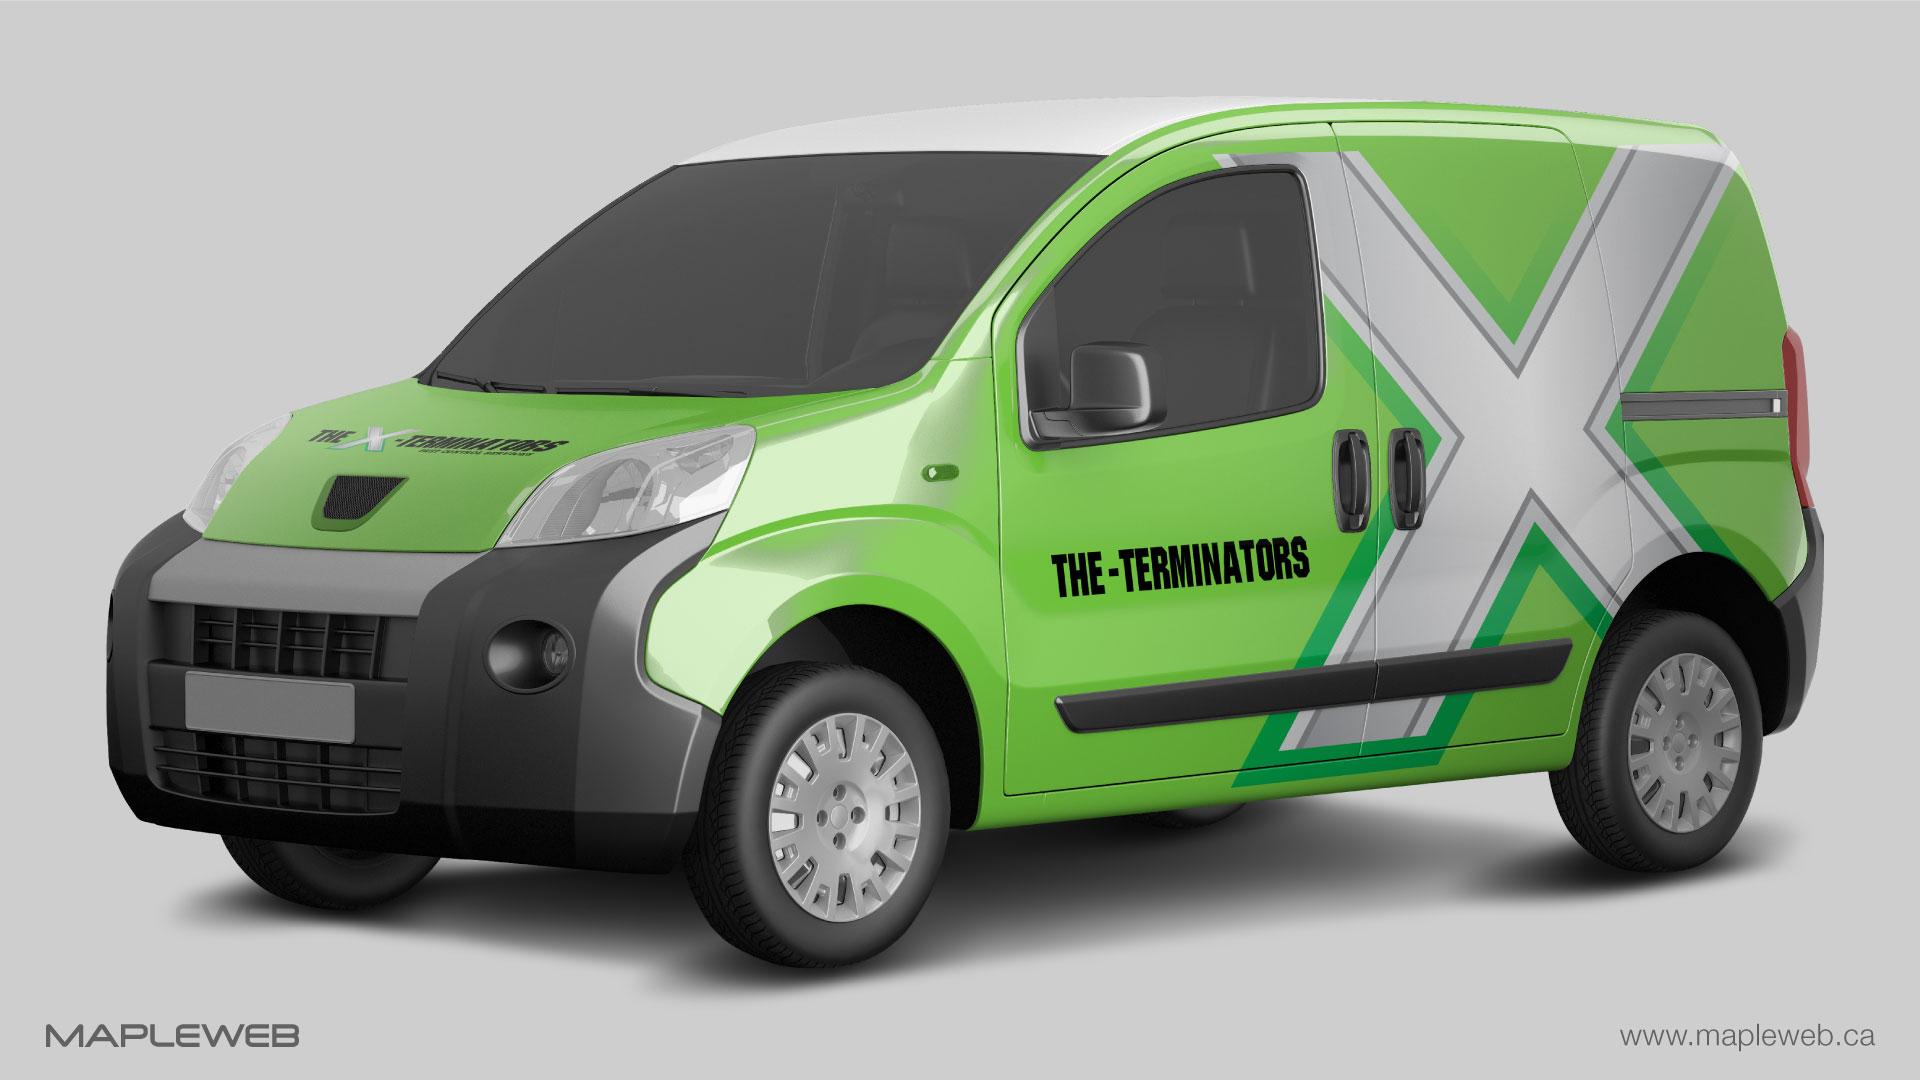 the-x-terminators-brand-logo-design-by-mapleweb-vancouver-canada-toyota-mock